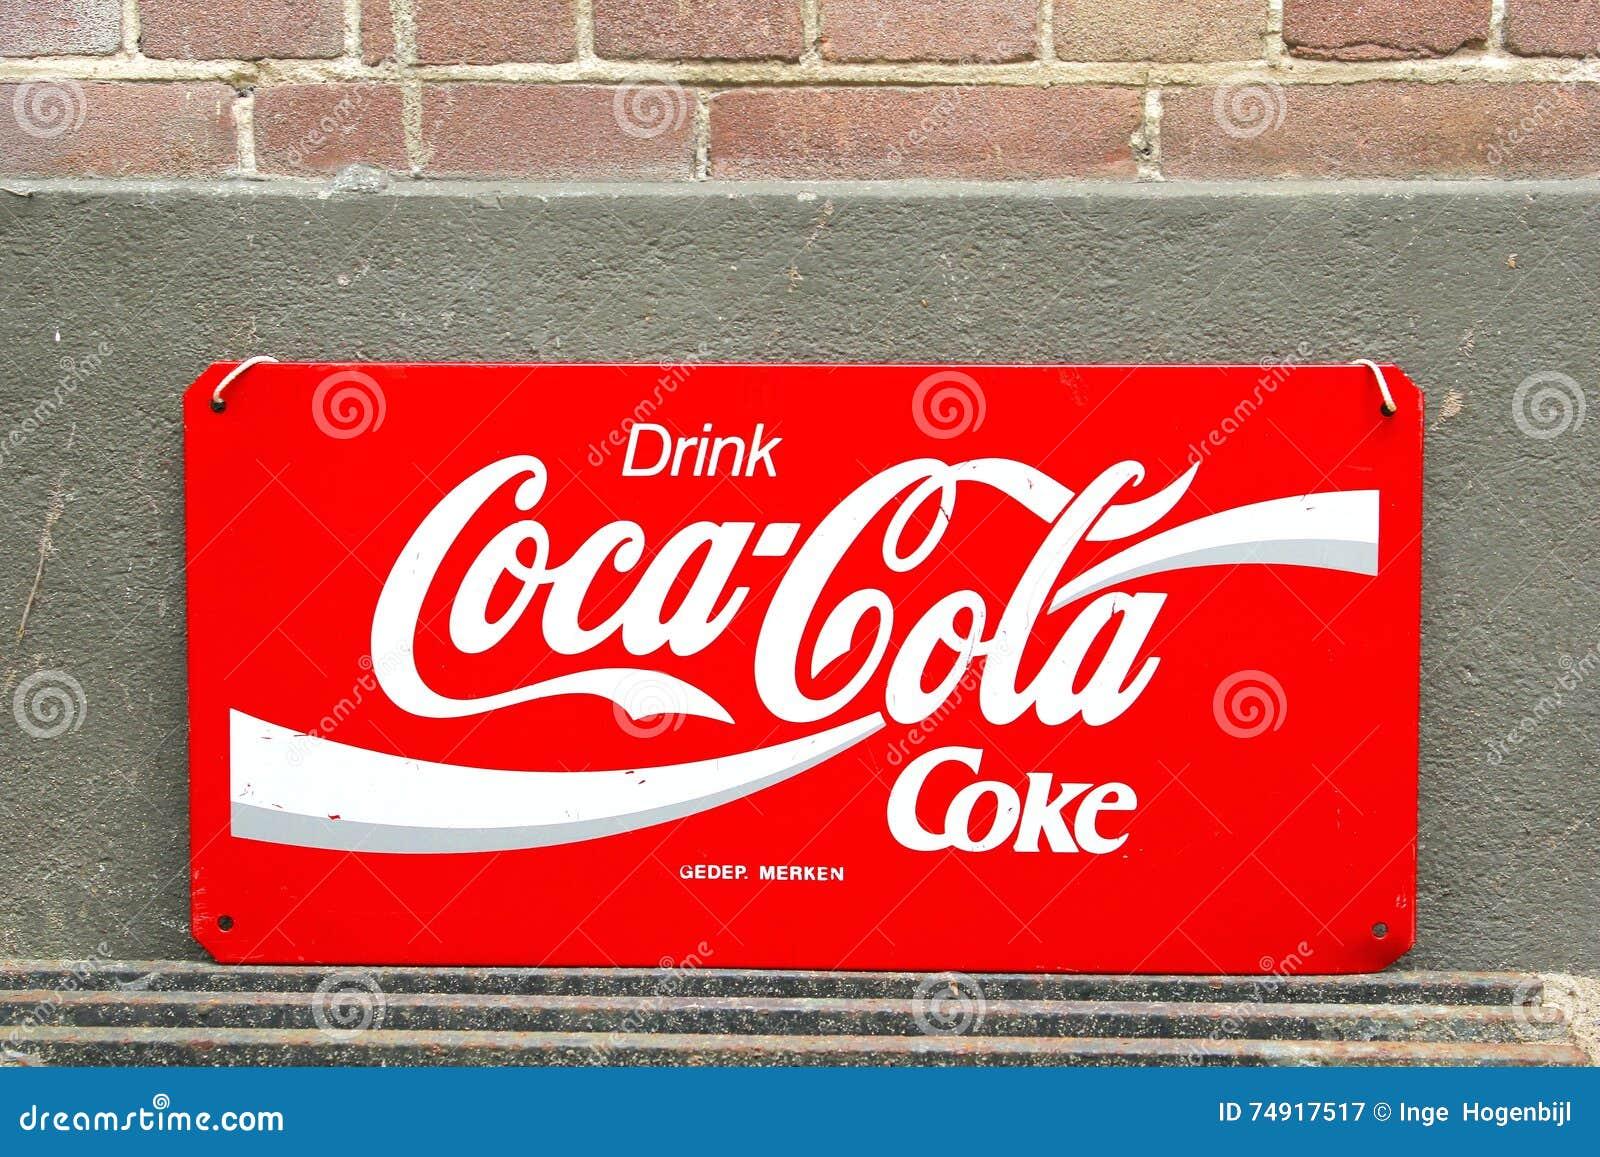 vintage retro signboard coca cola editorial photography image 74917517. Black Bedroom Furniture Sets. Home Design Ideas